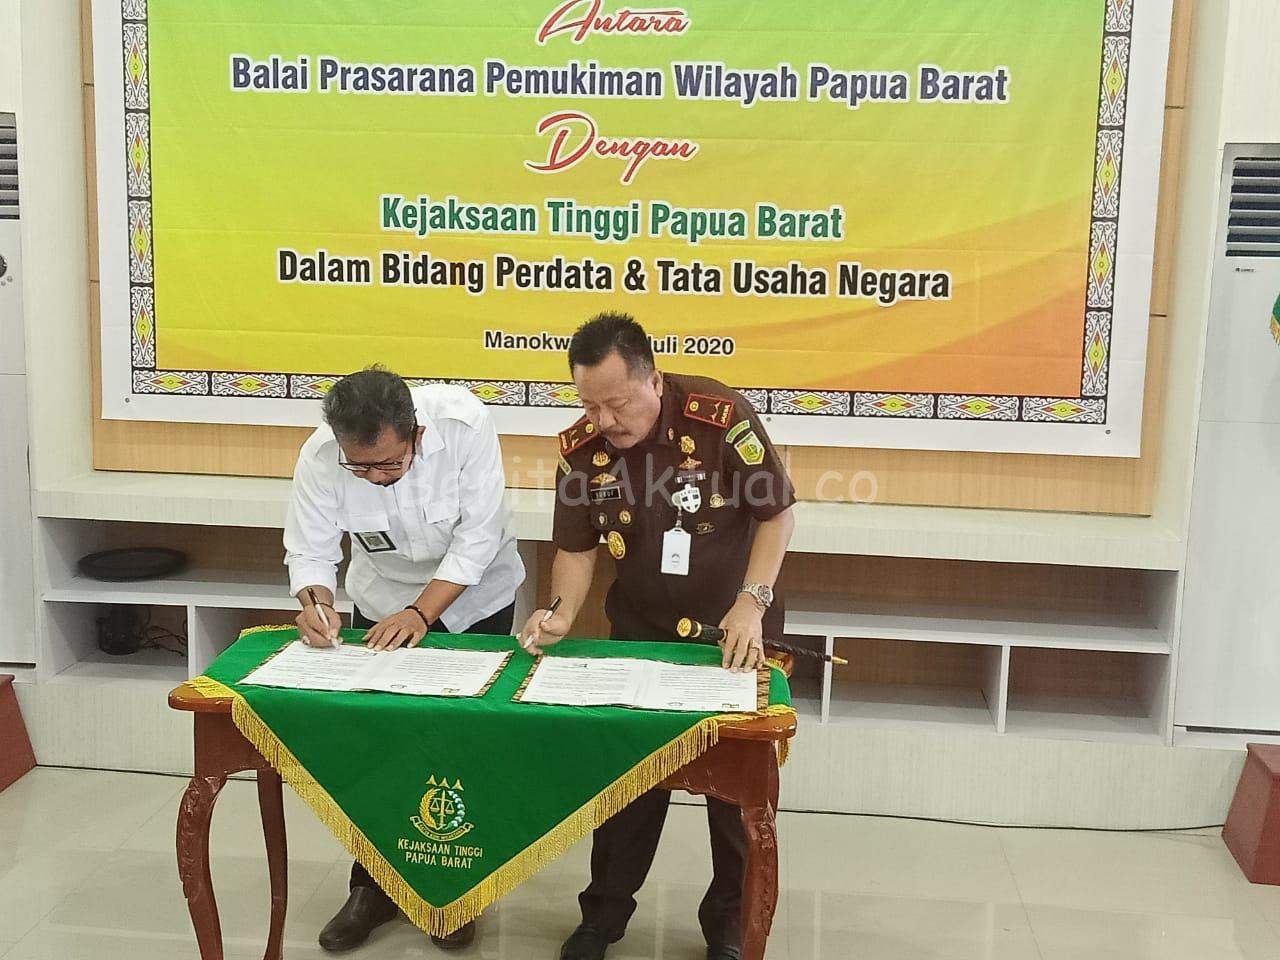 Kawal Proyek Strategis, BPPW PB Dan Kejati Papua Barat Teken MoU 18 IMG 20200715 WA0026